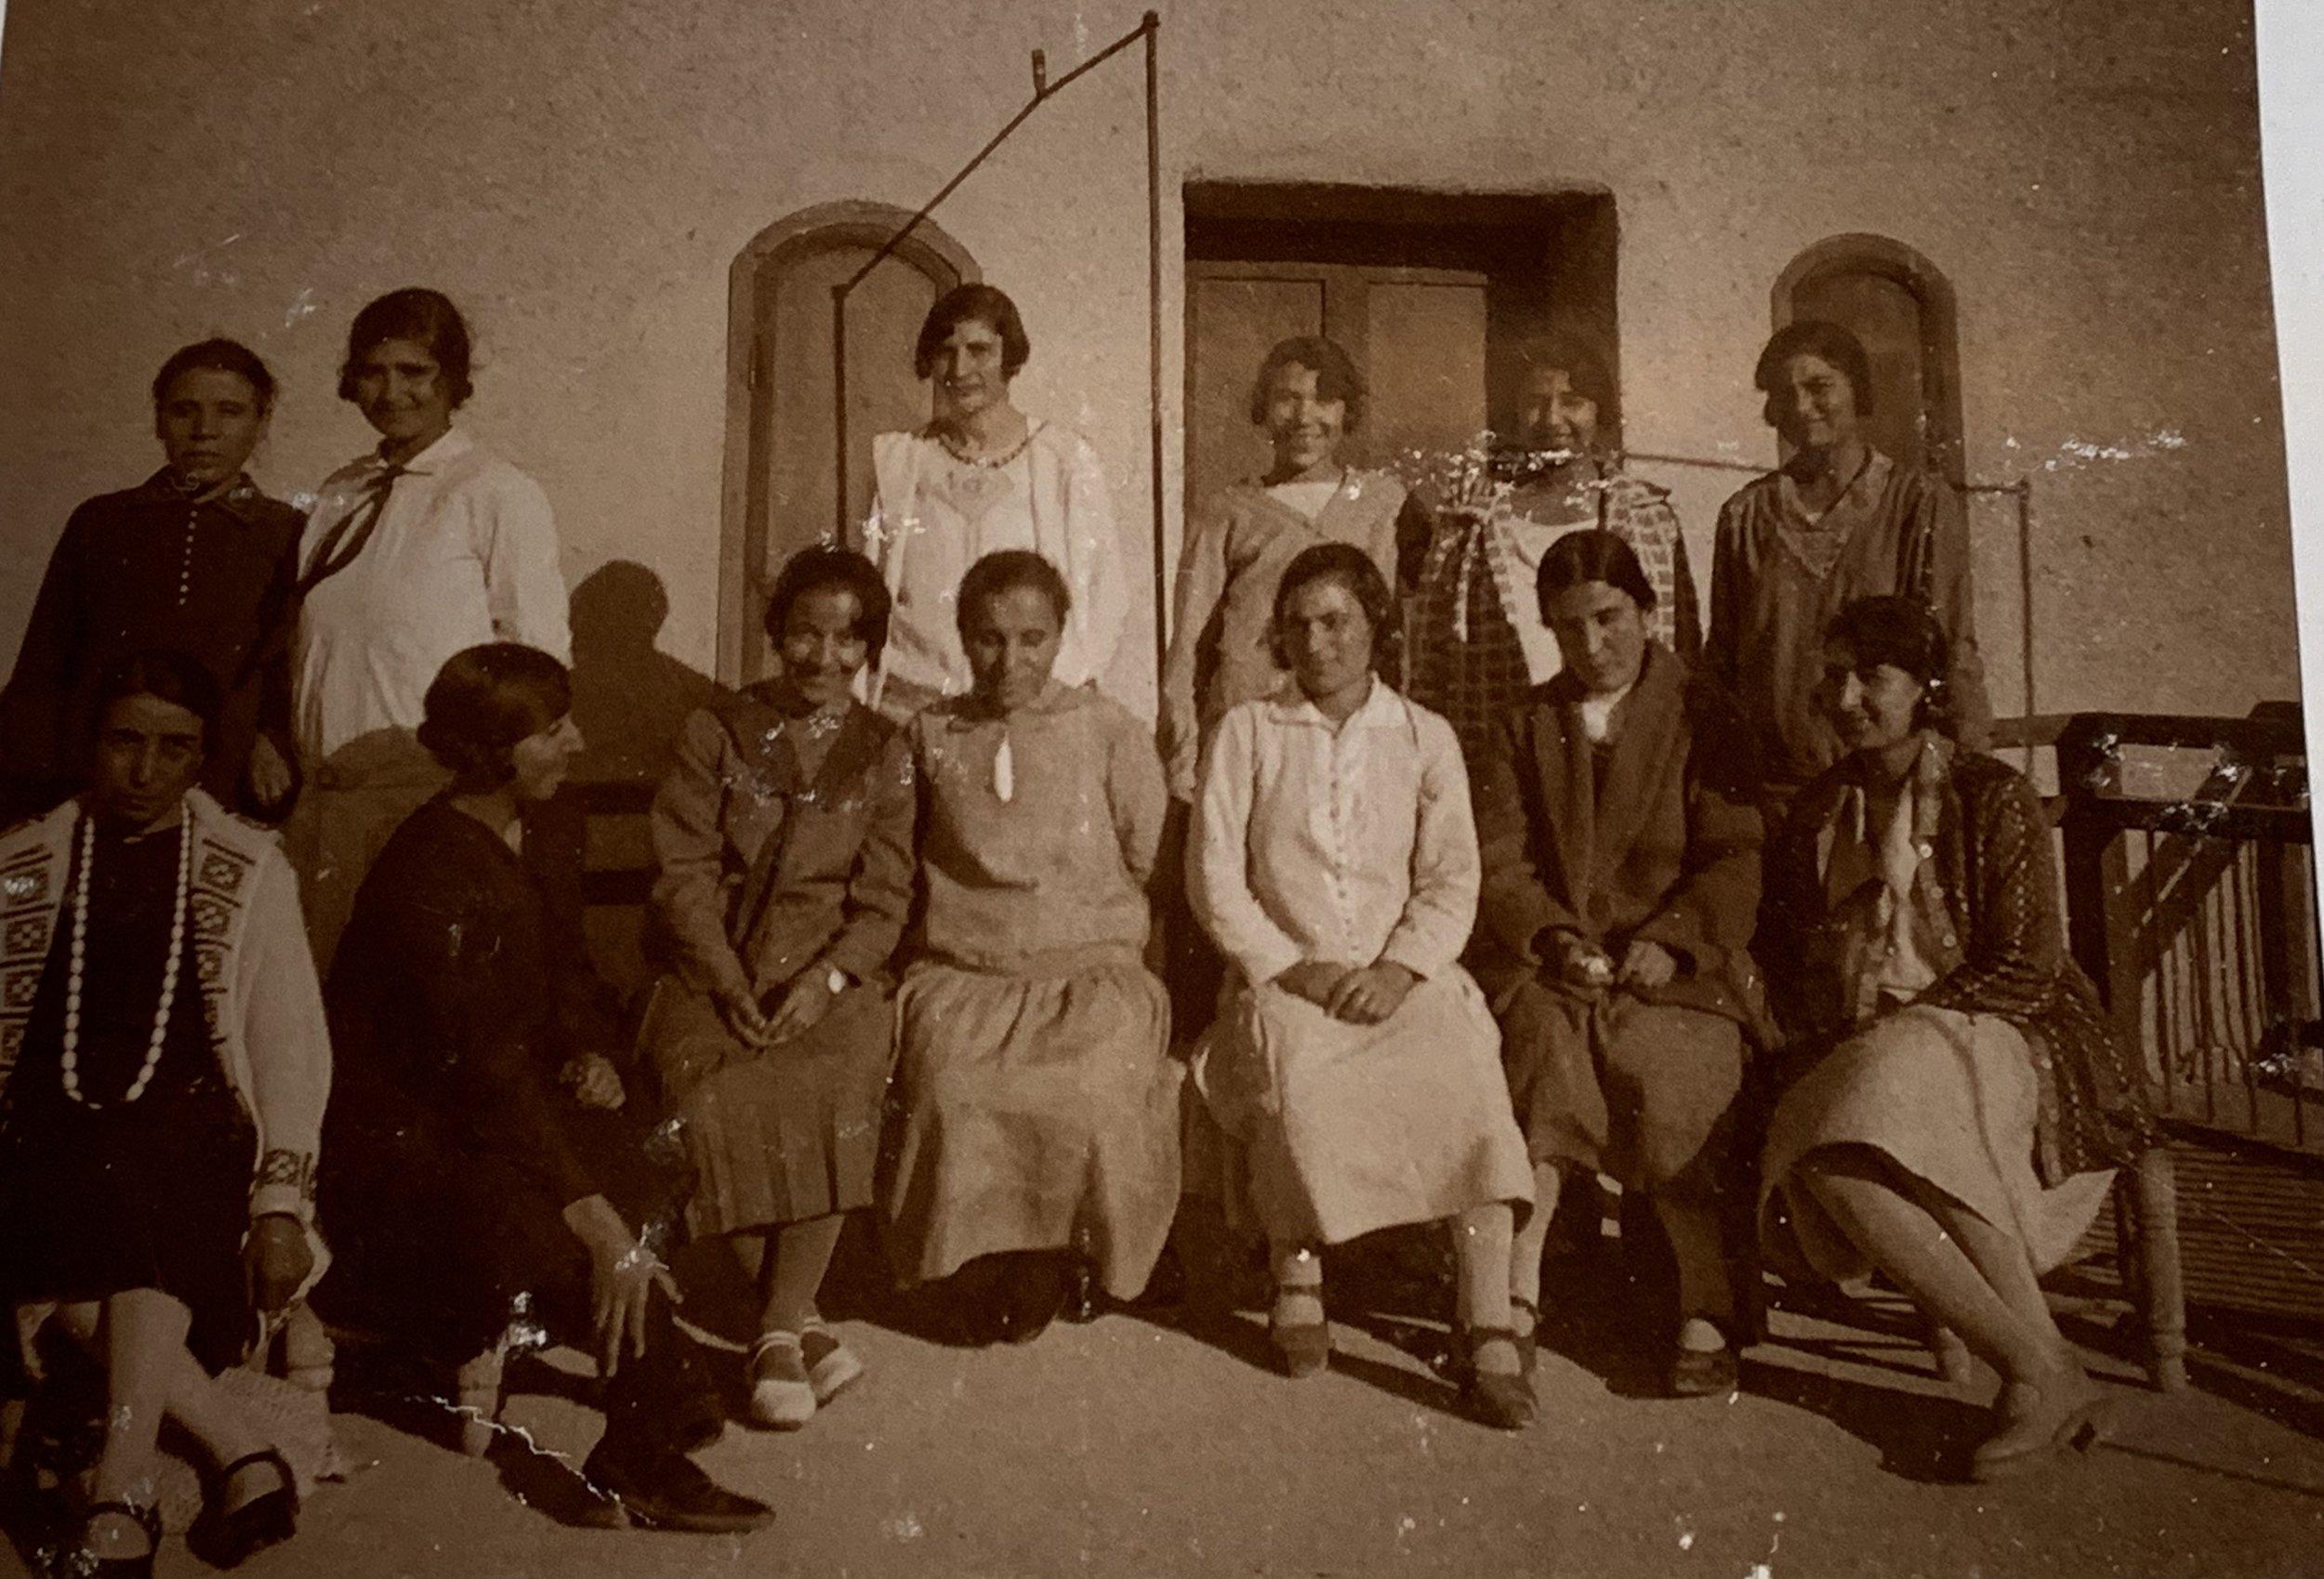 The early congregation of Nabak Presbyterian Church